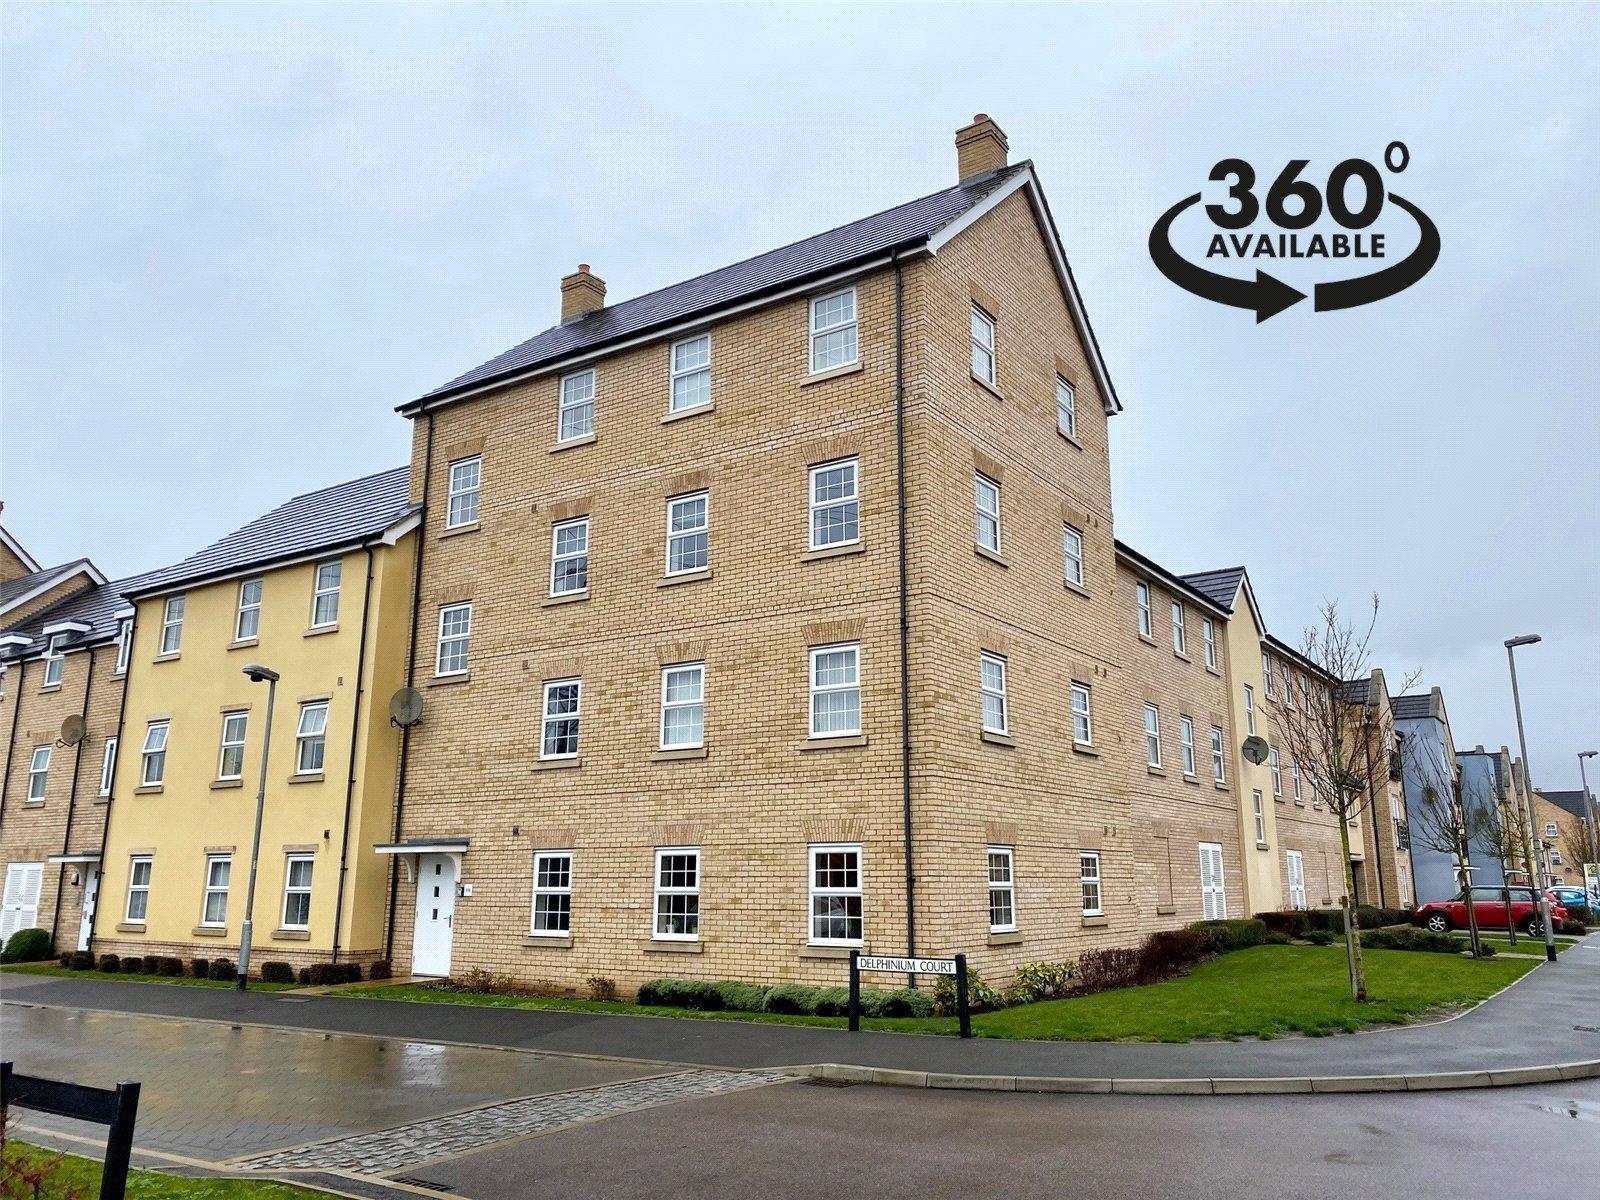 2 bed apartment for sale in Eynesbury, Delphinium Court, PE19 2LL, PE19